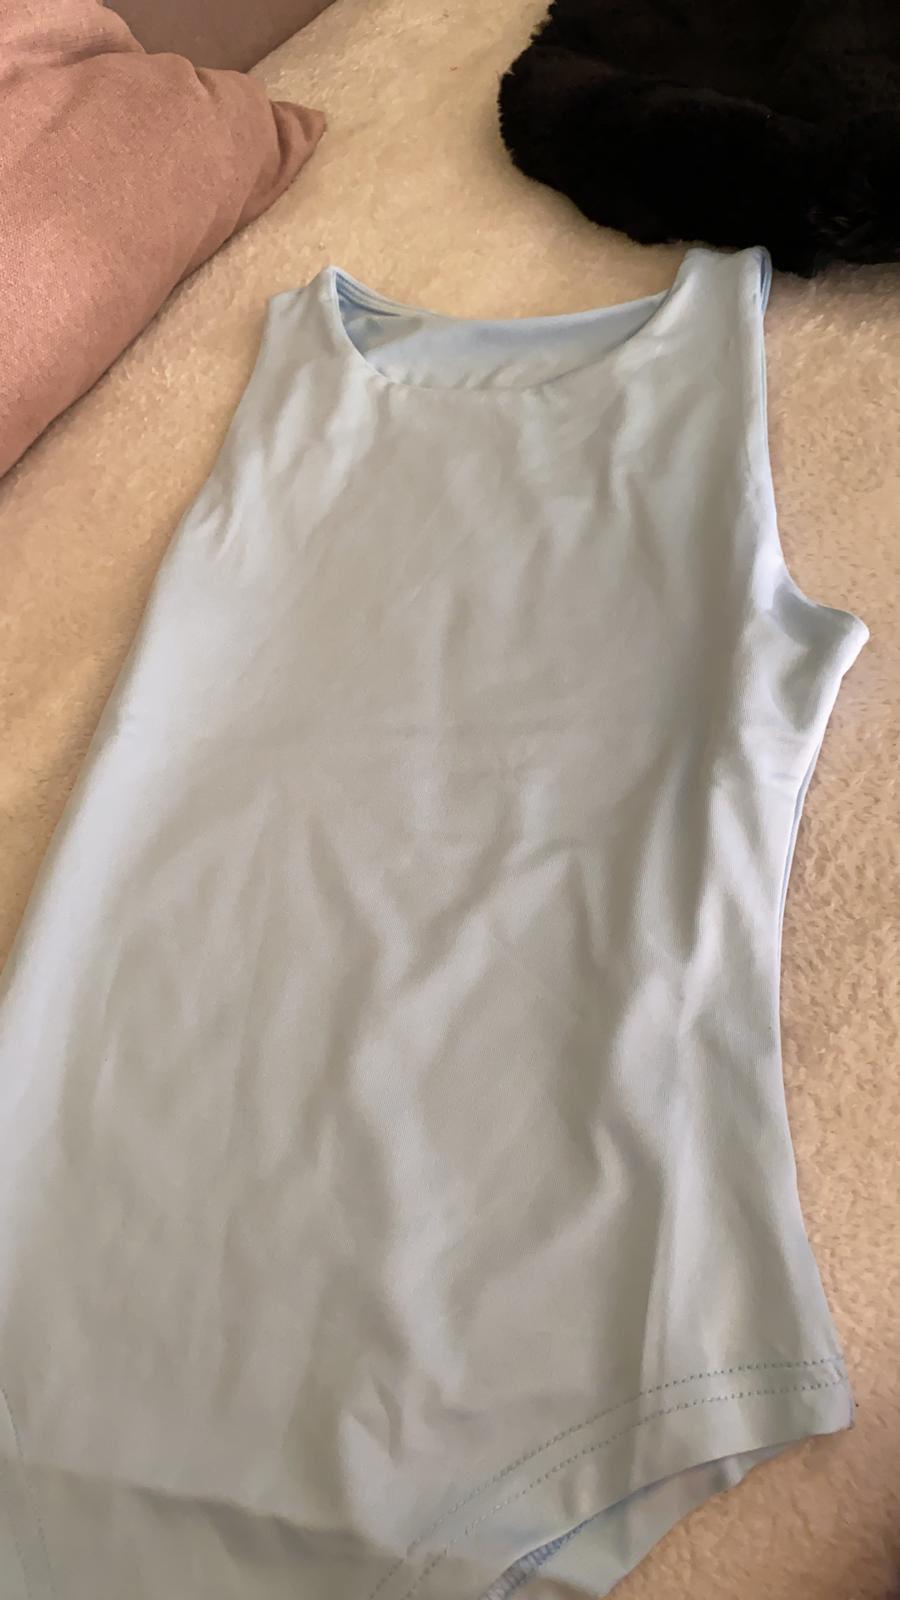 FSDA O Neck Summer Sleeveless Sexy Bodysuit Women 2020 Off Shoulder Body Tops Streetwear Casual White Bodysuits| |   - AliExpress